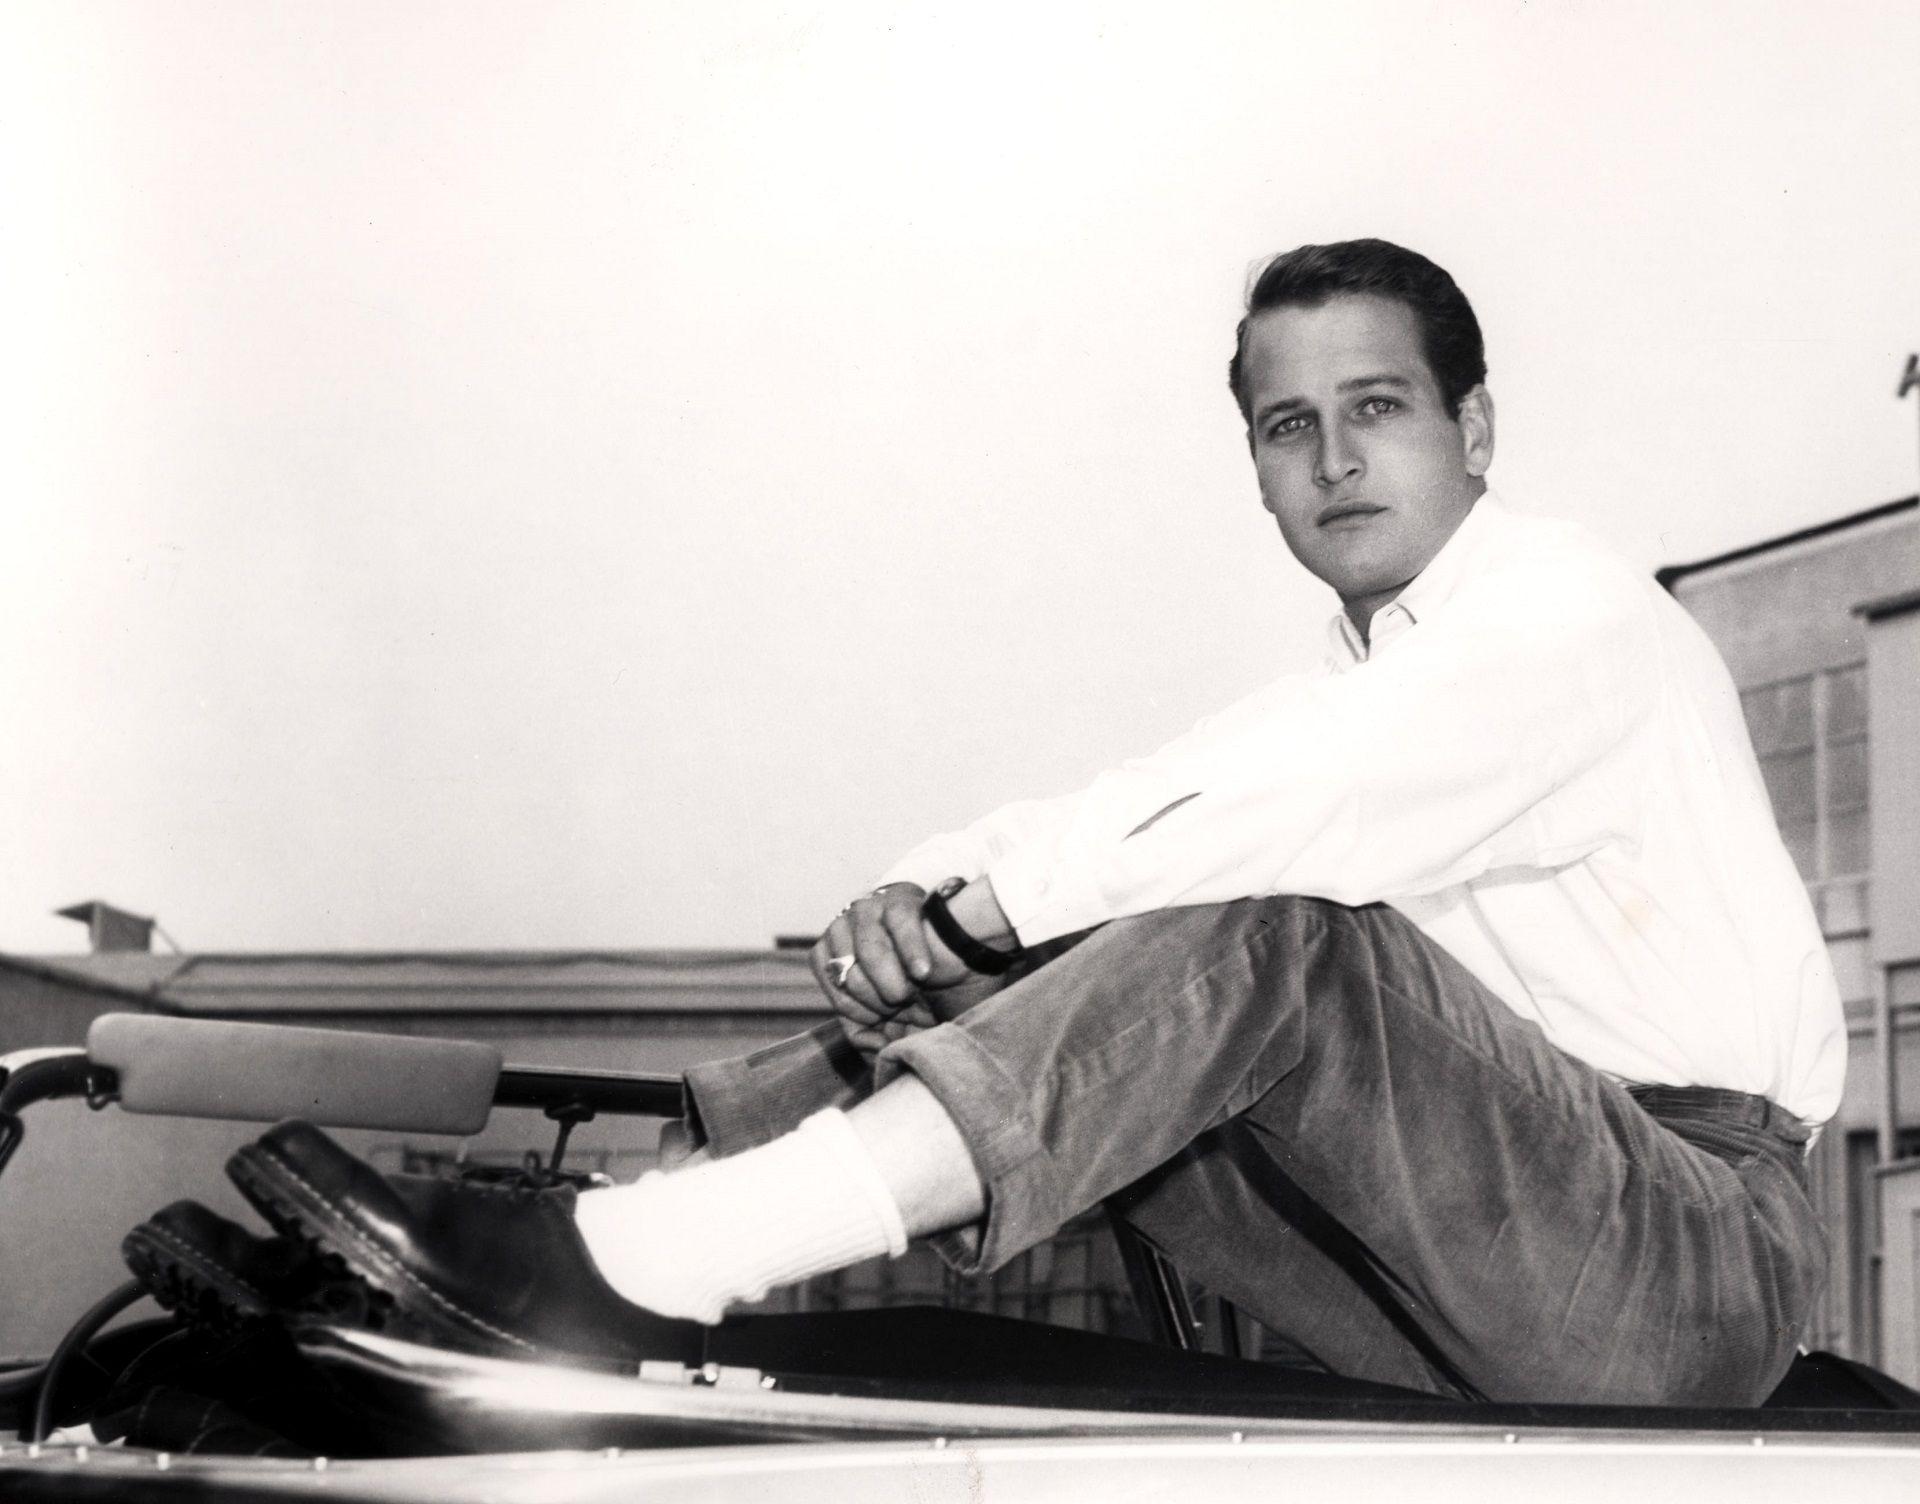 Paul Newman en 1957 (Crédito: Shutterstock)